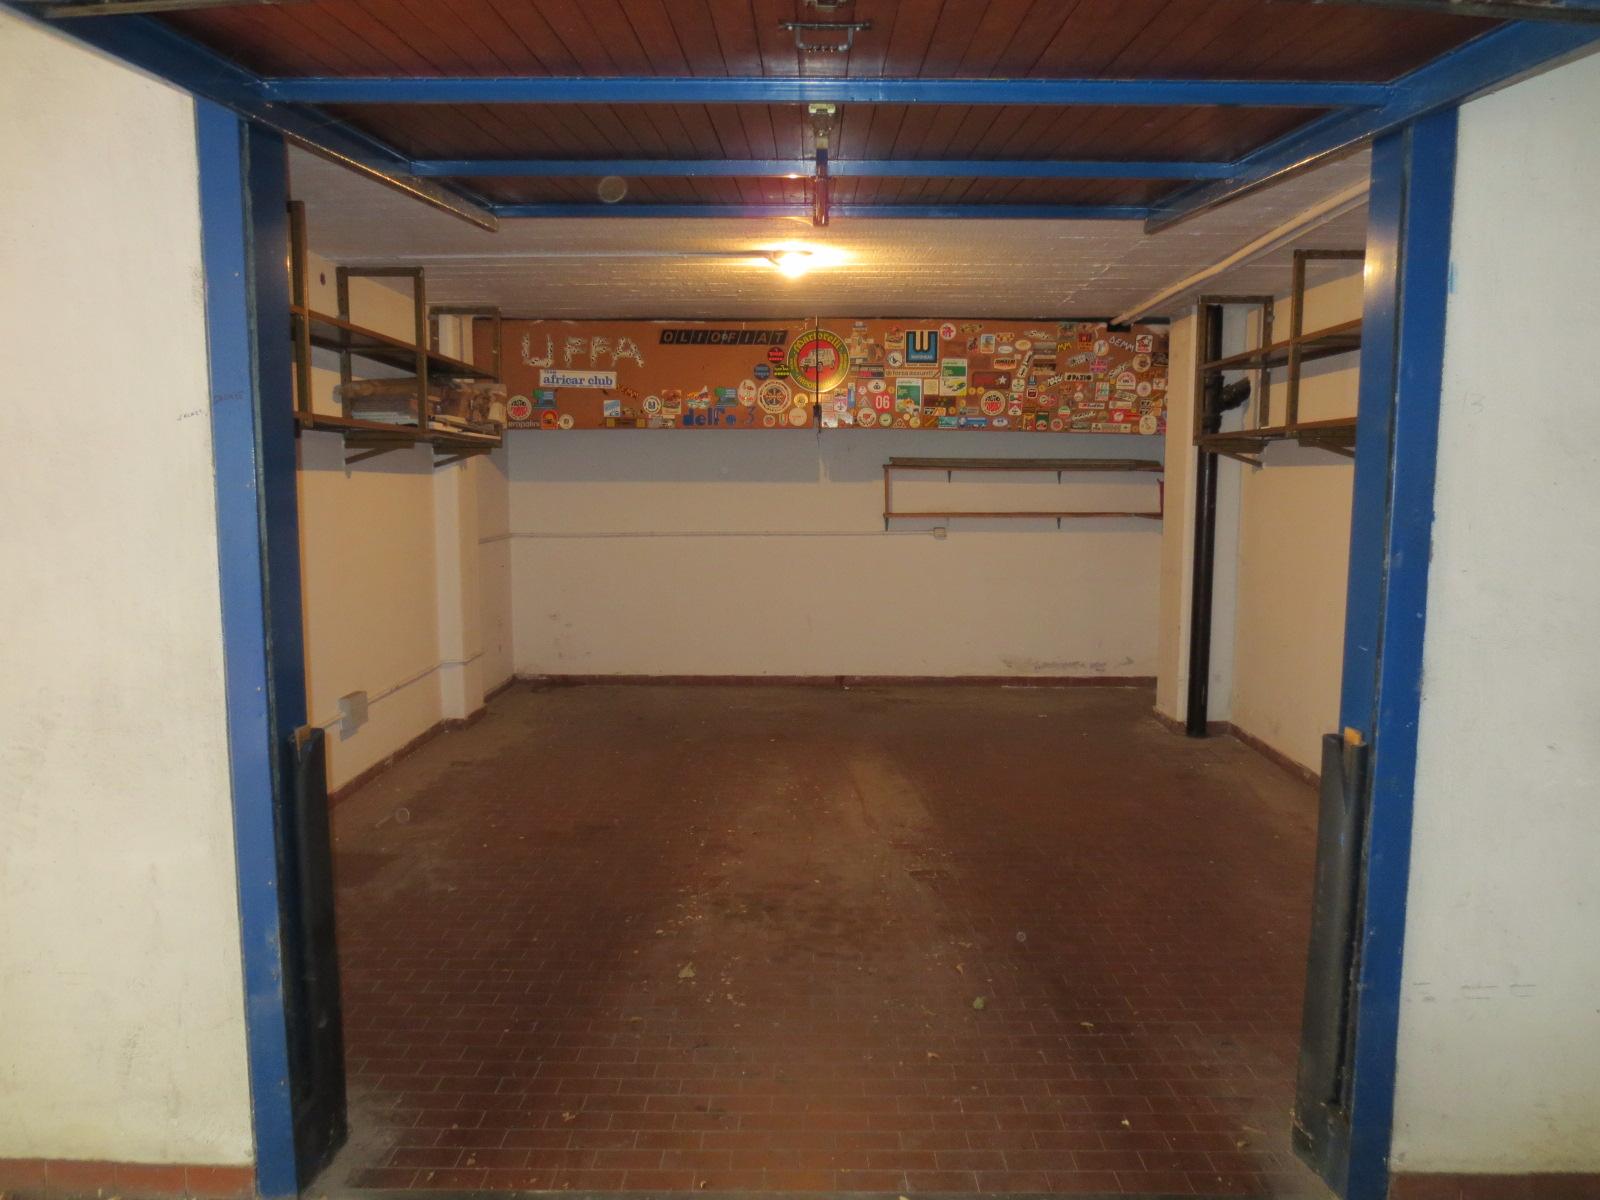 Centro Storico garage in vendita mq. 28 Viale Pietramellara 35